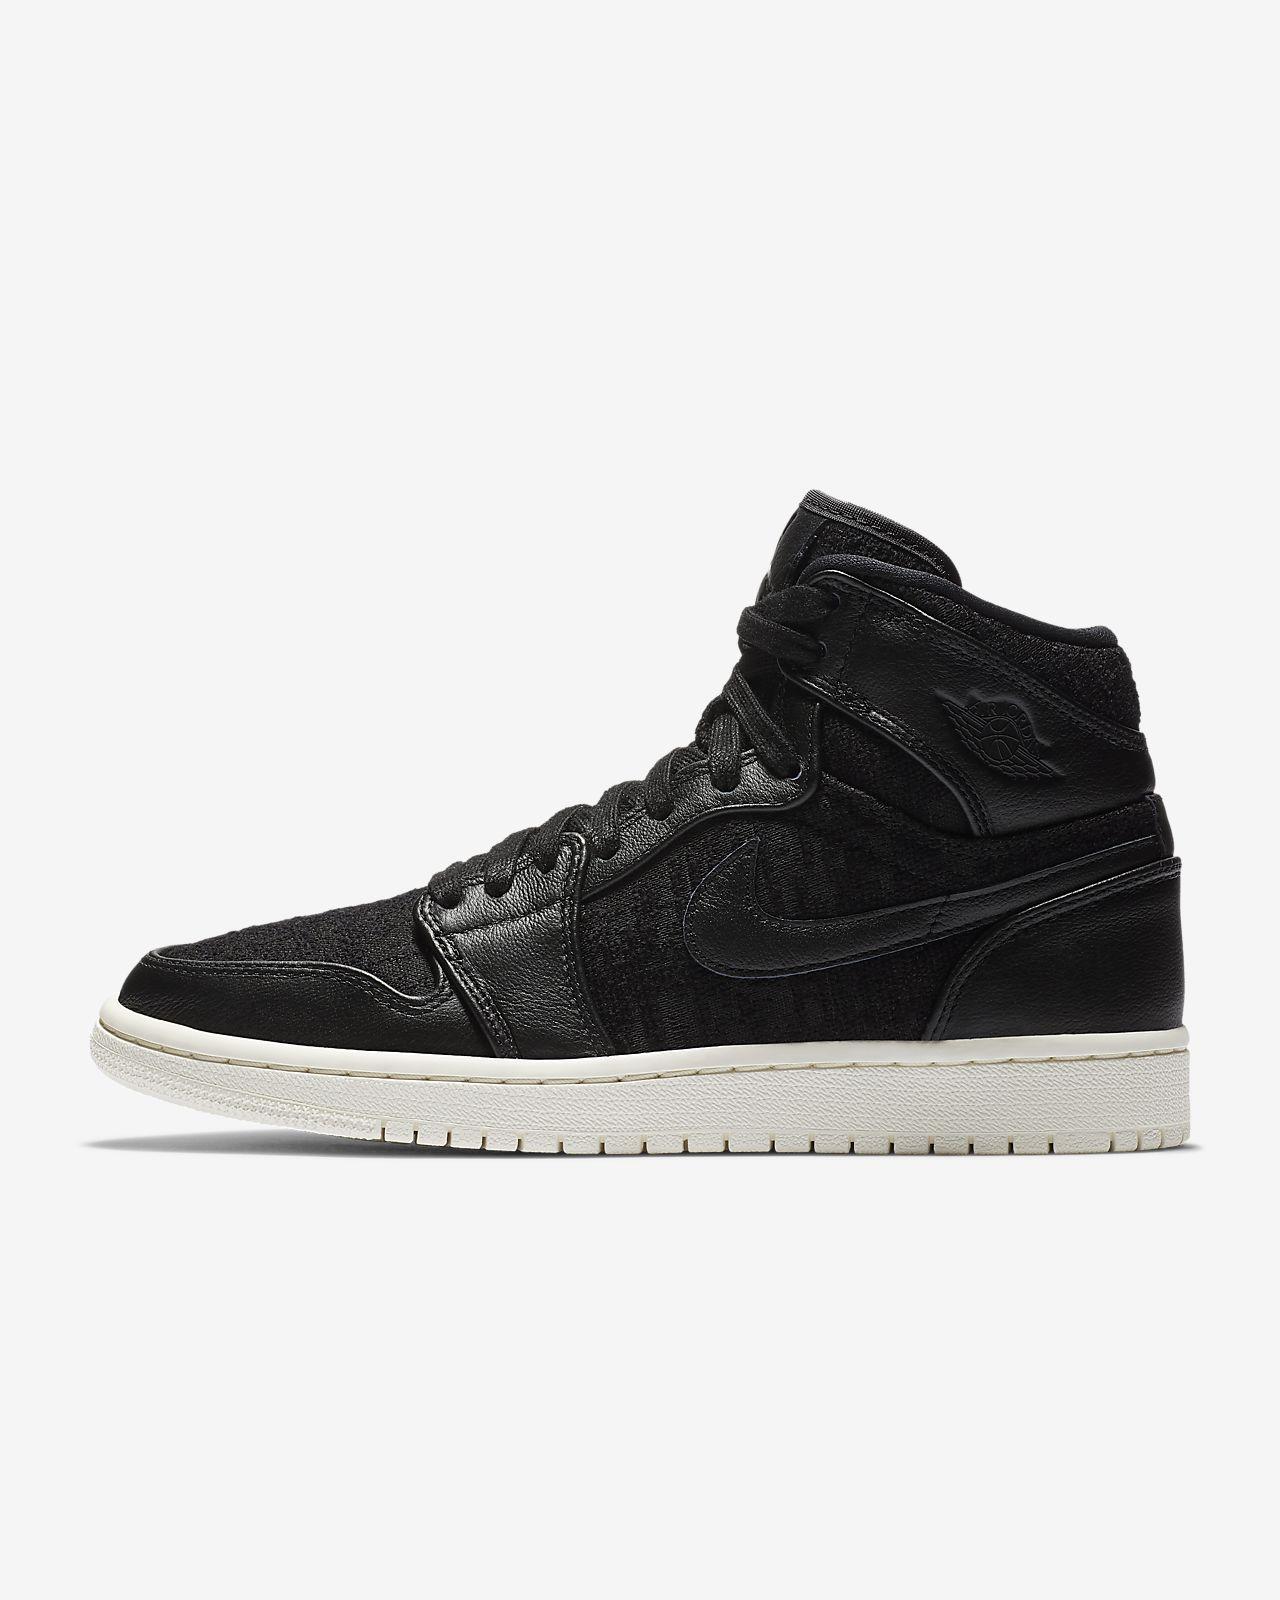 Dámská bota Air Jordan 1 Retro High Premium. Nike.com CZ 8c2117f3f6